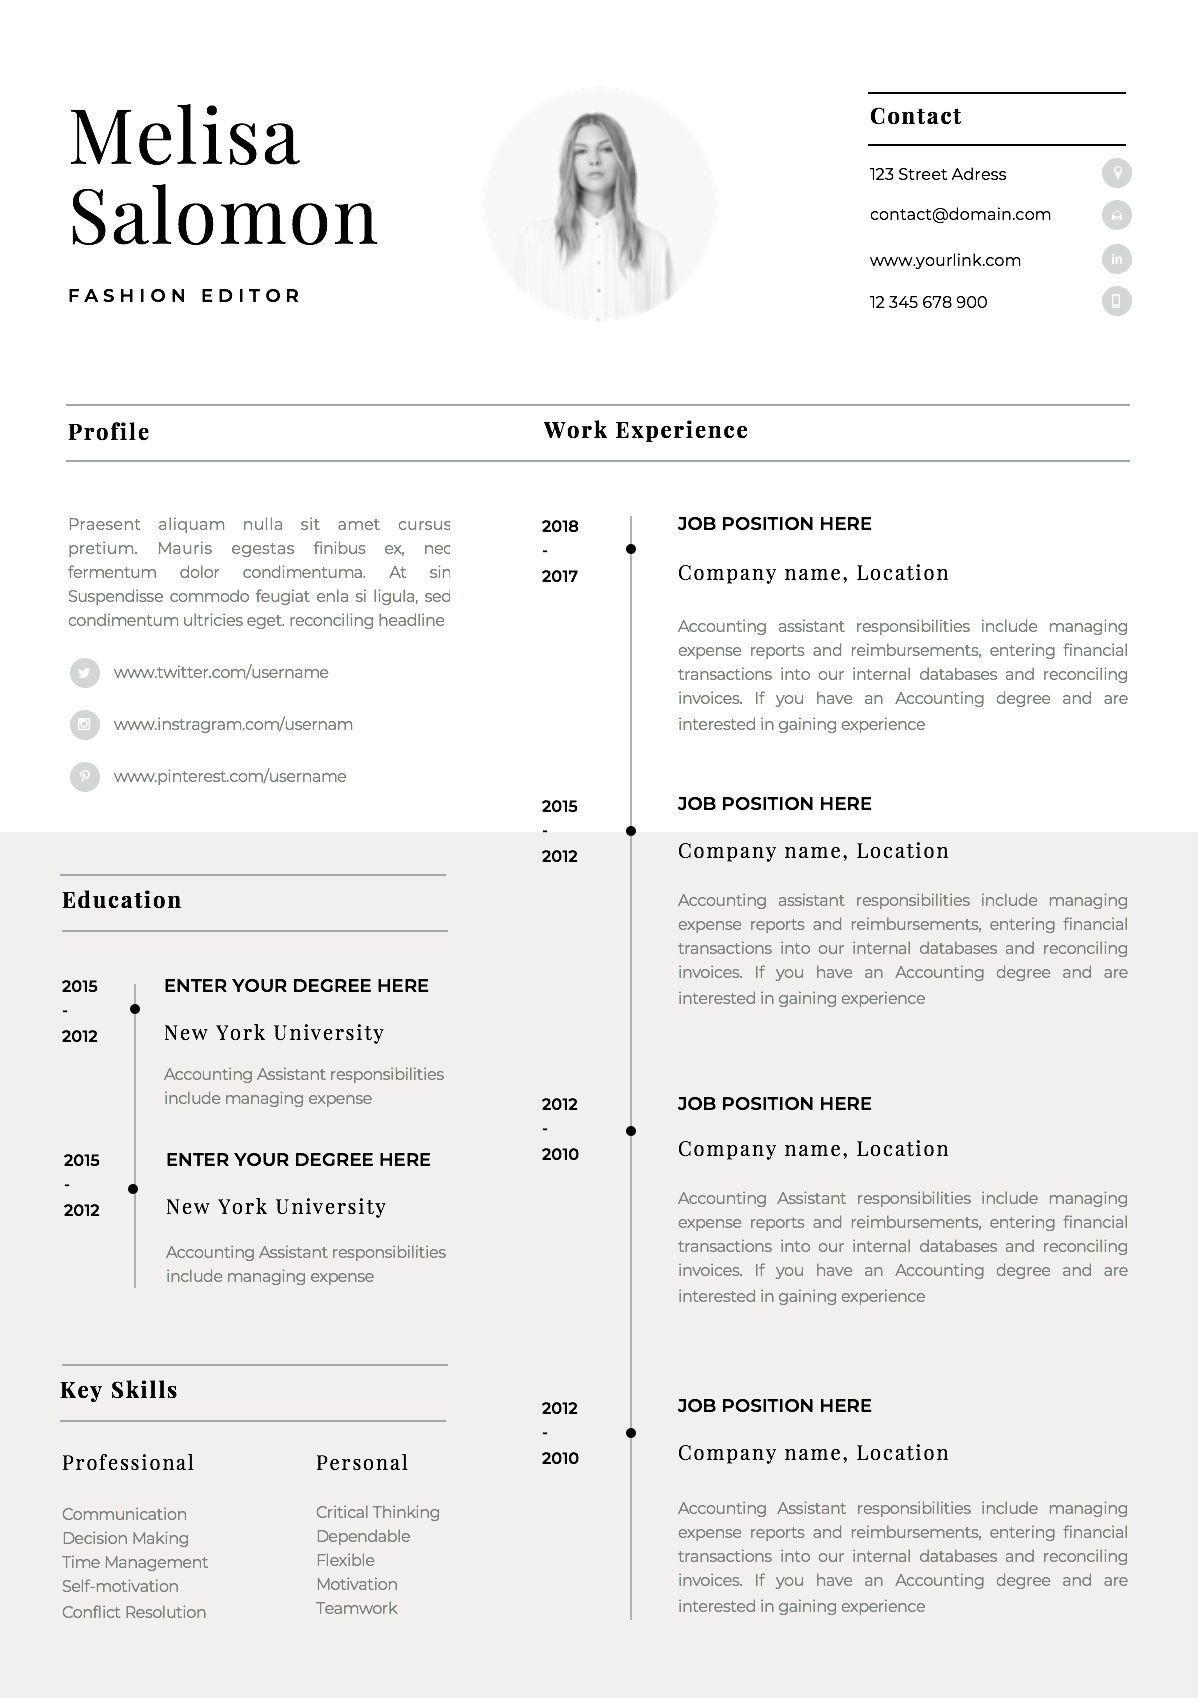 000 Rare Resume Template On Word High Def  Free Download Australia Microsoft Office 2007 PhilippineFull